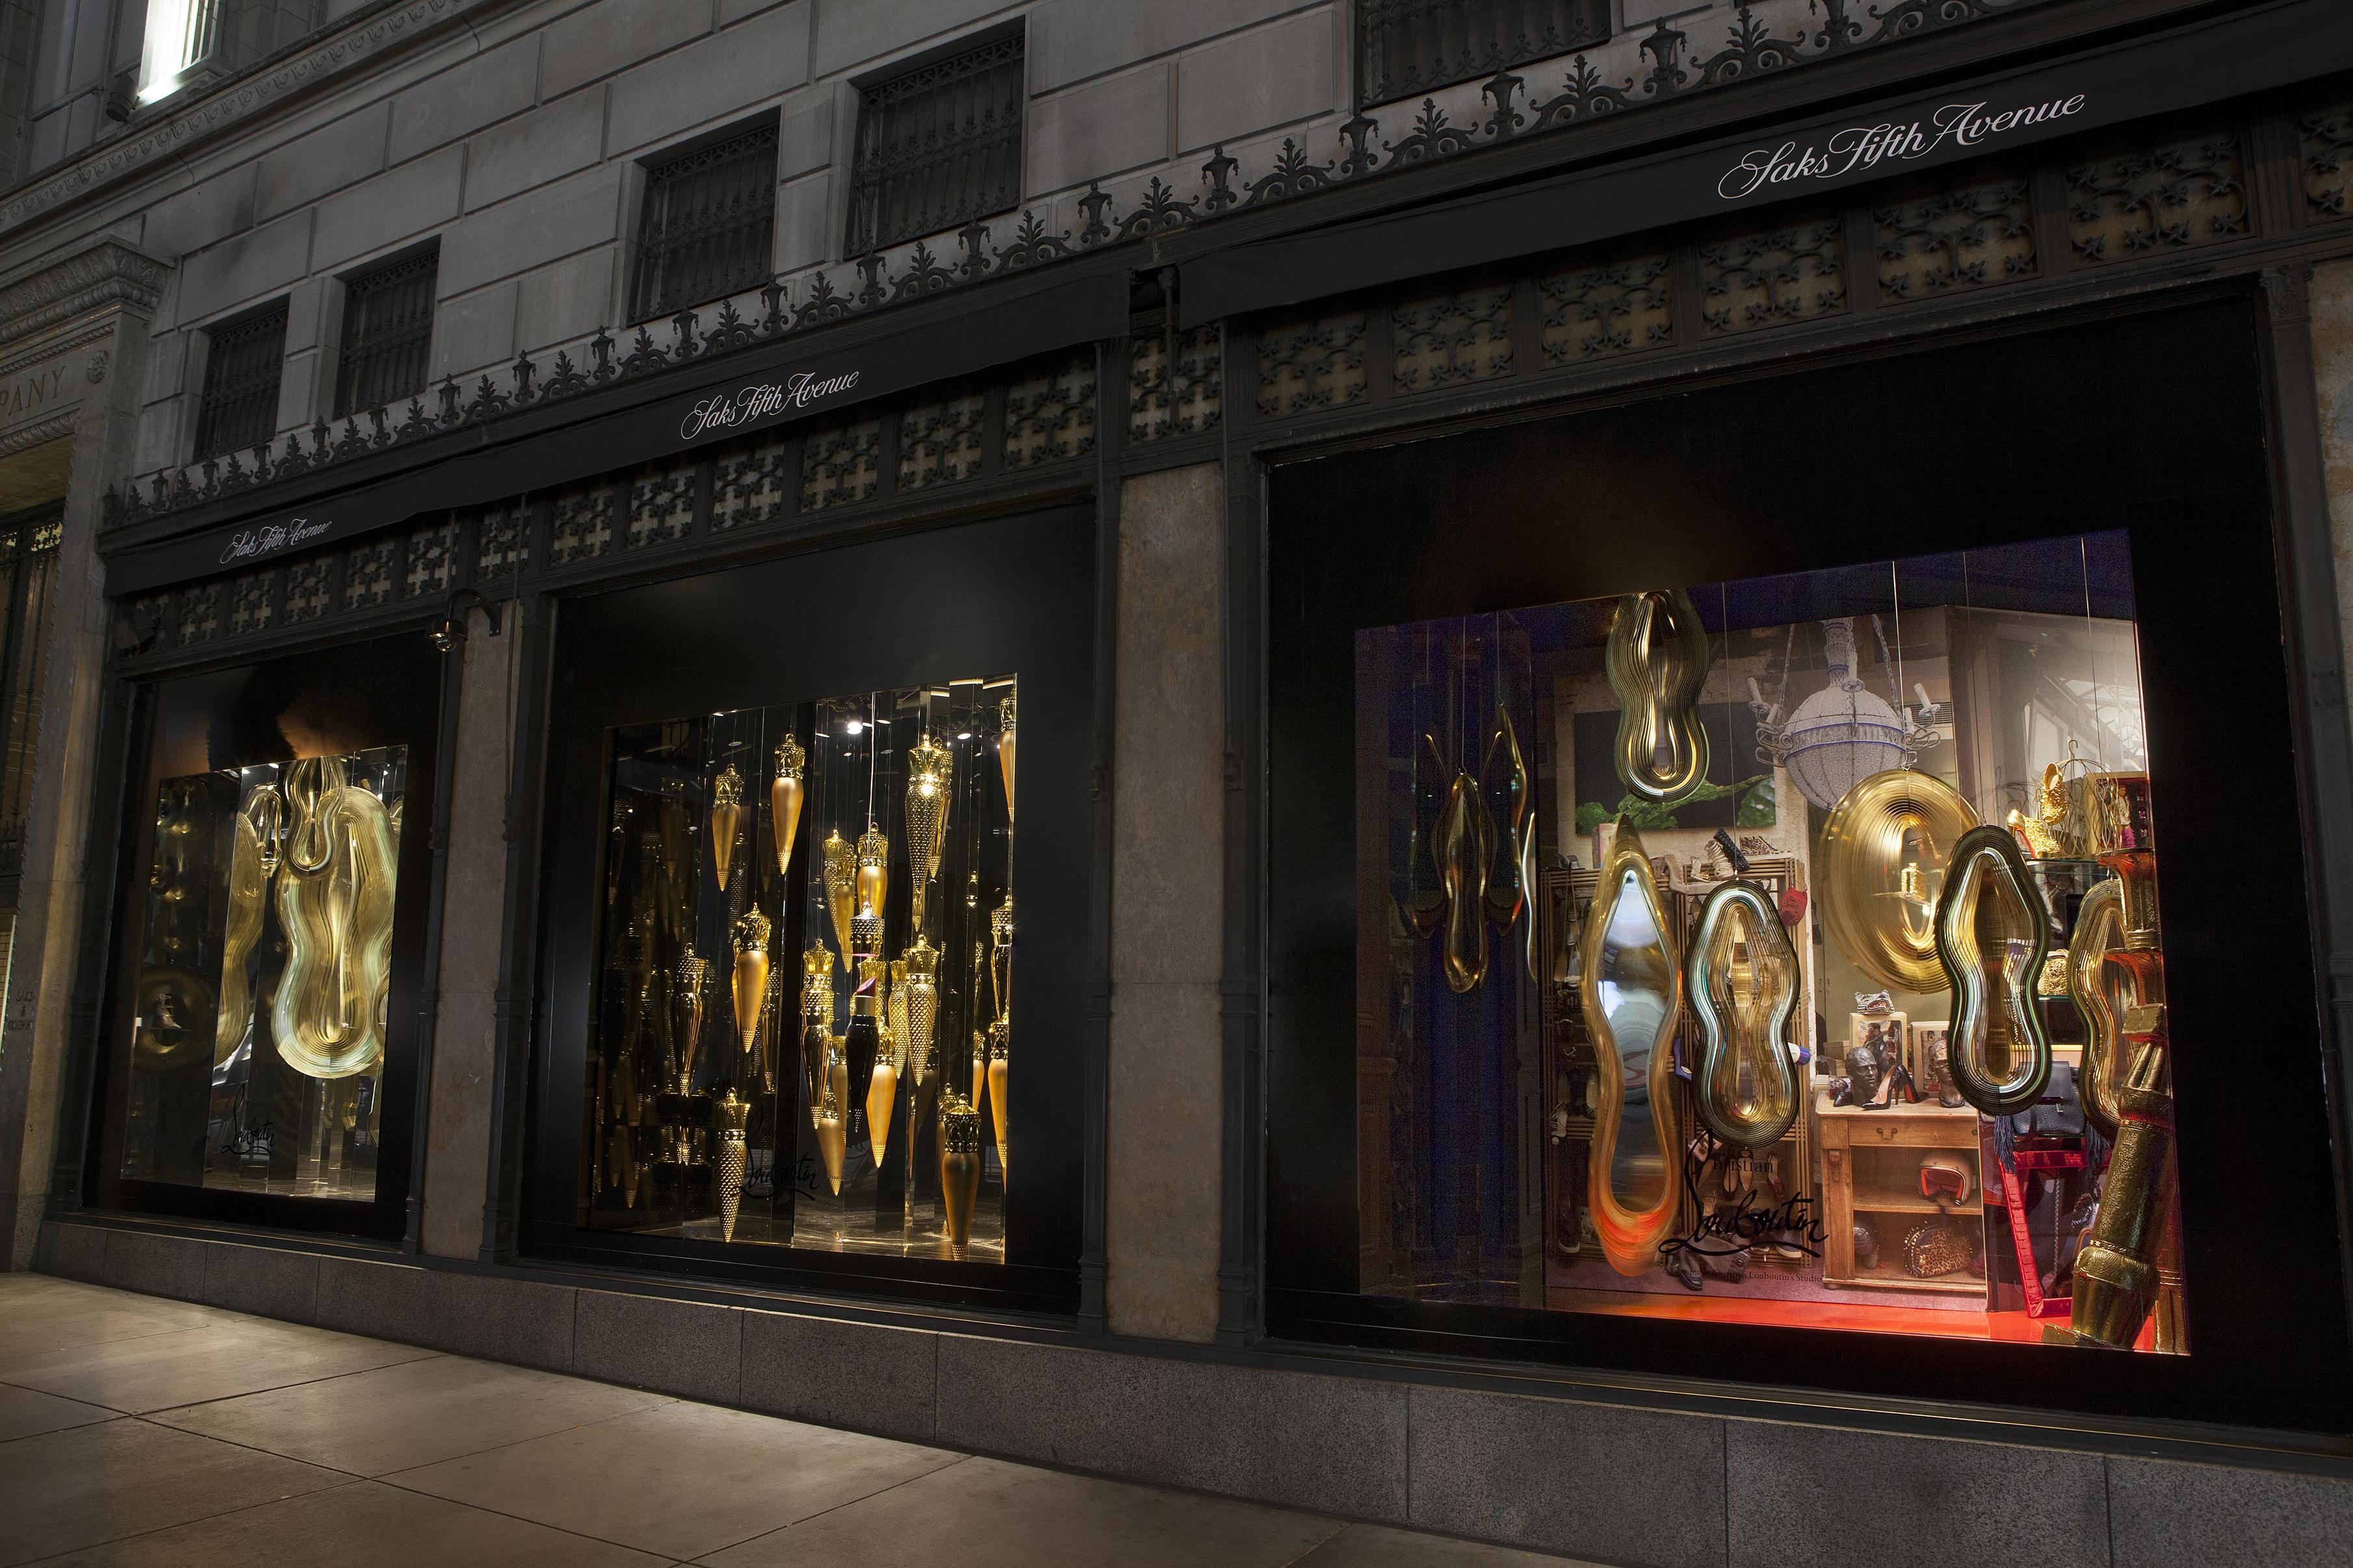 Saks Fifth Avenue (New York City)